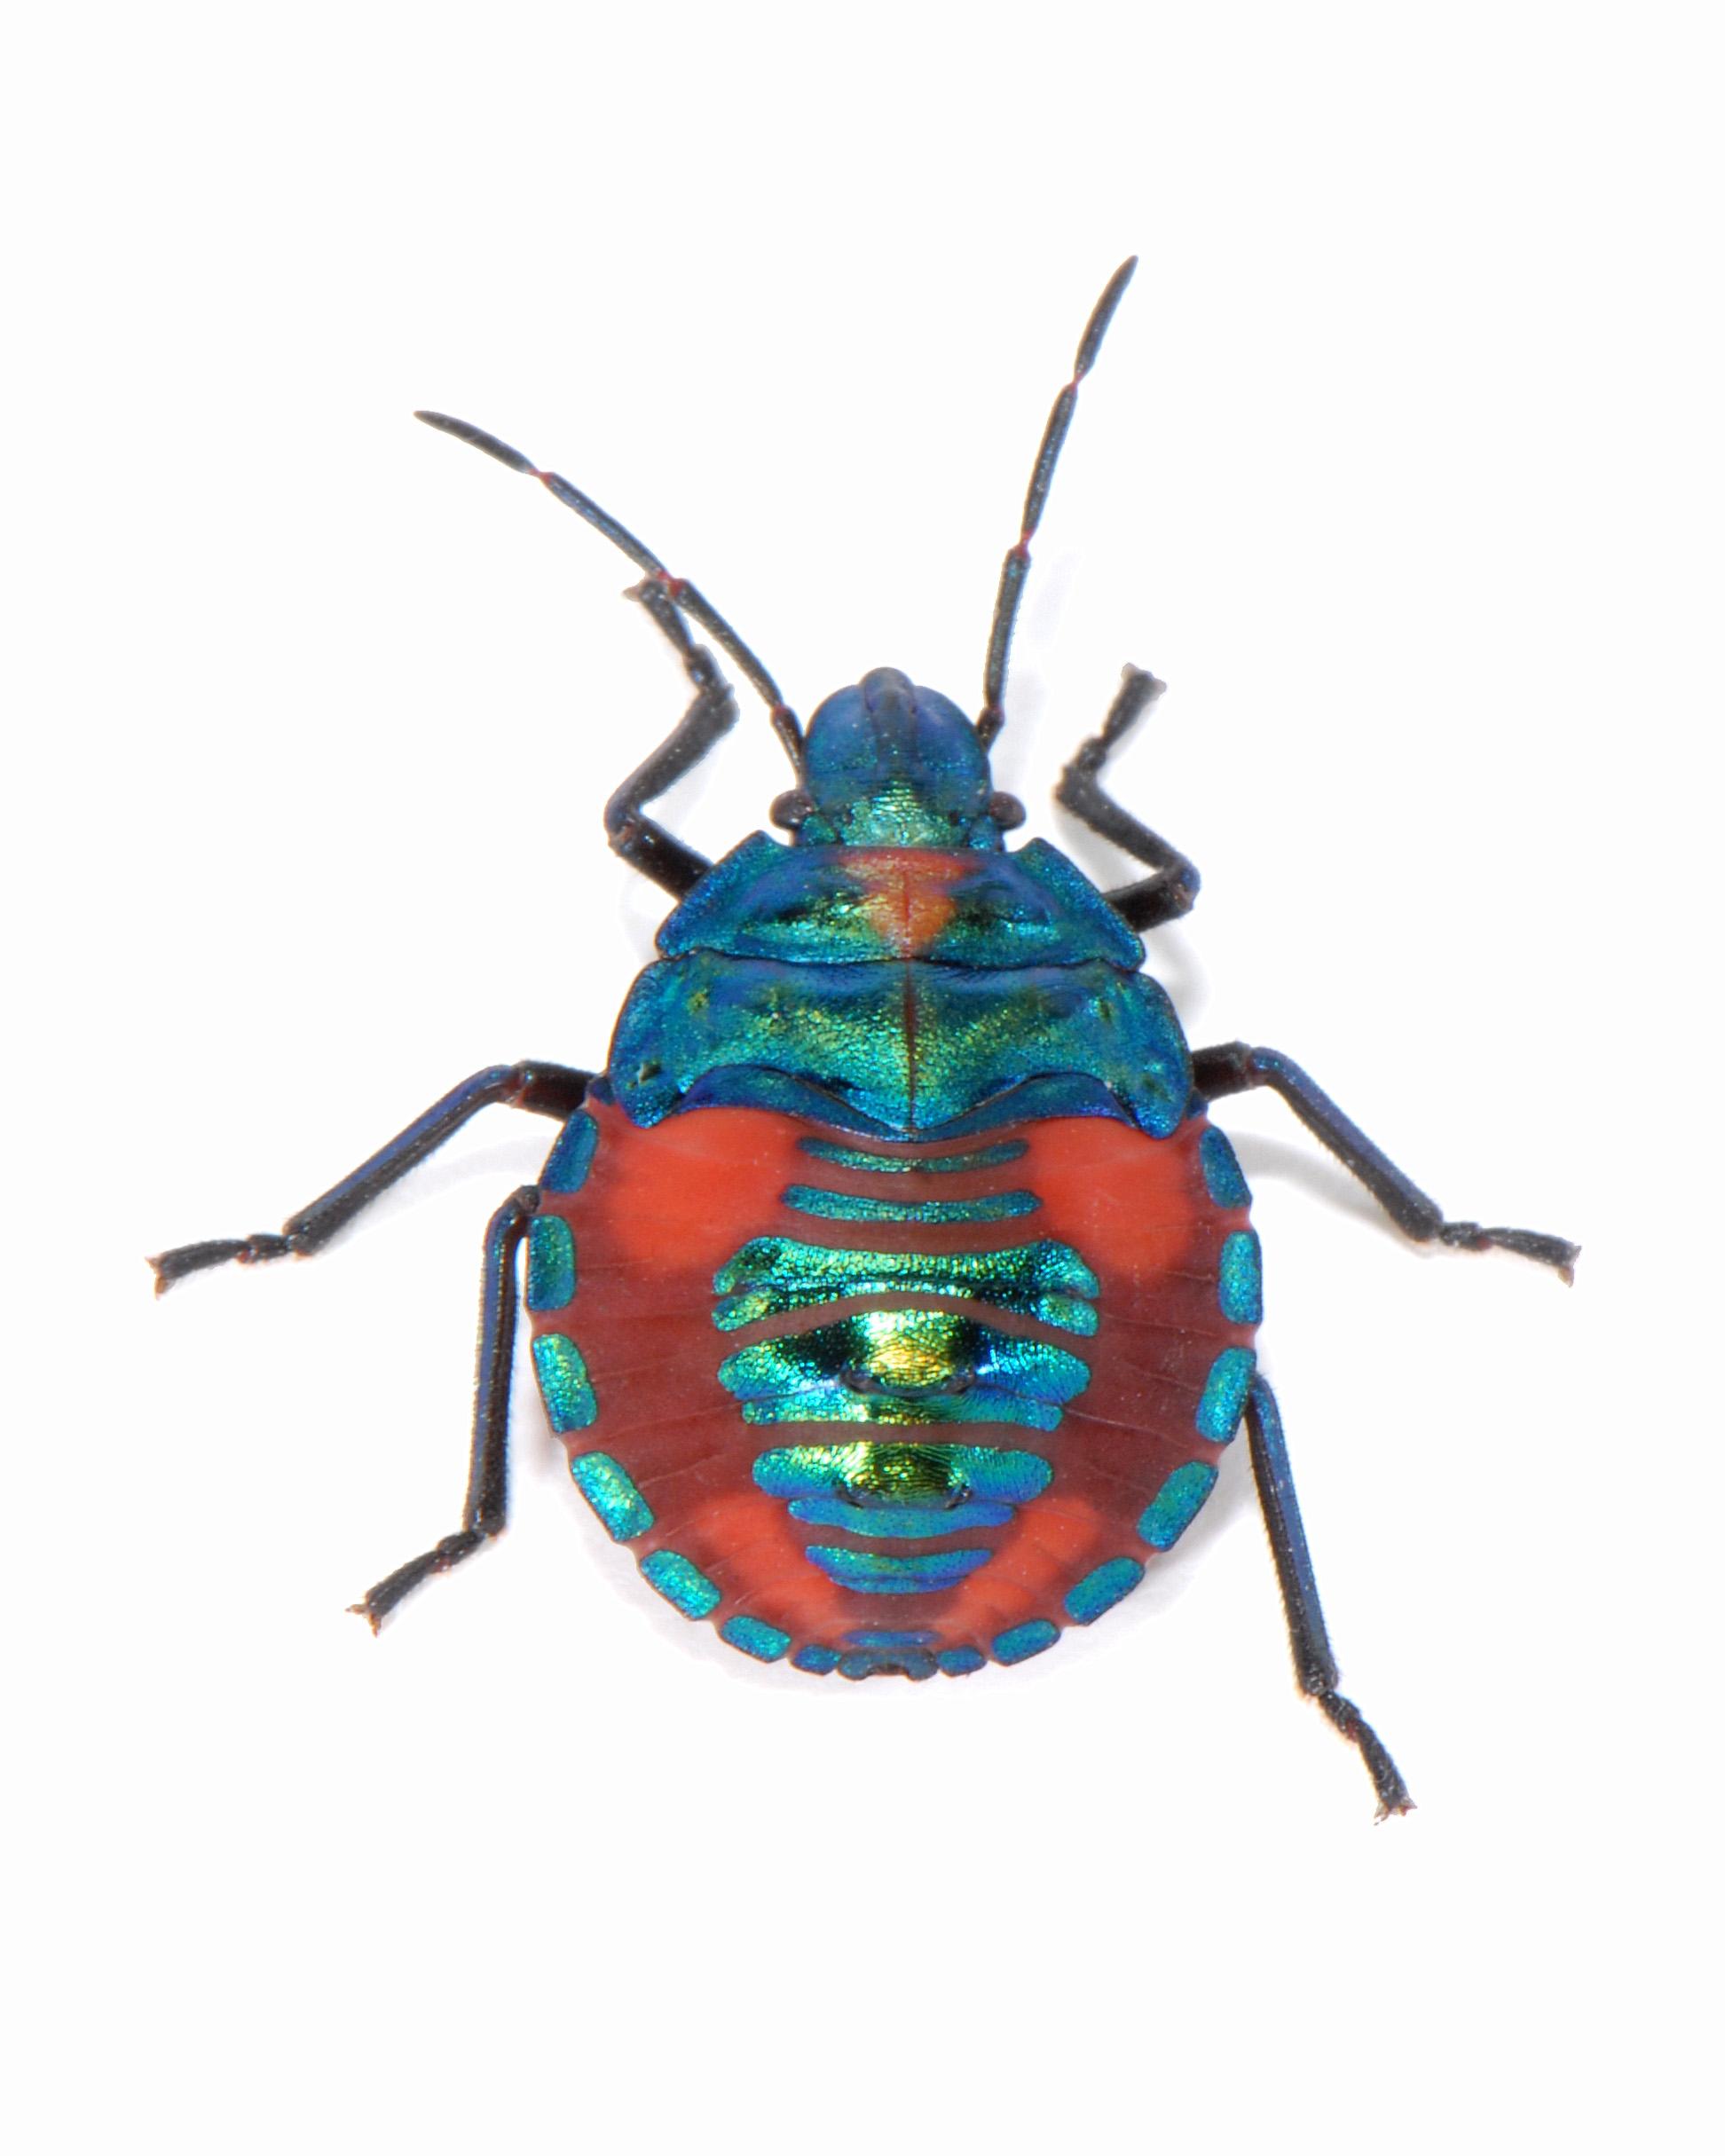 ... - Scutelleridae) - hibiscus harlequin bug (nymph) - dorsal view.jpg